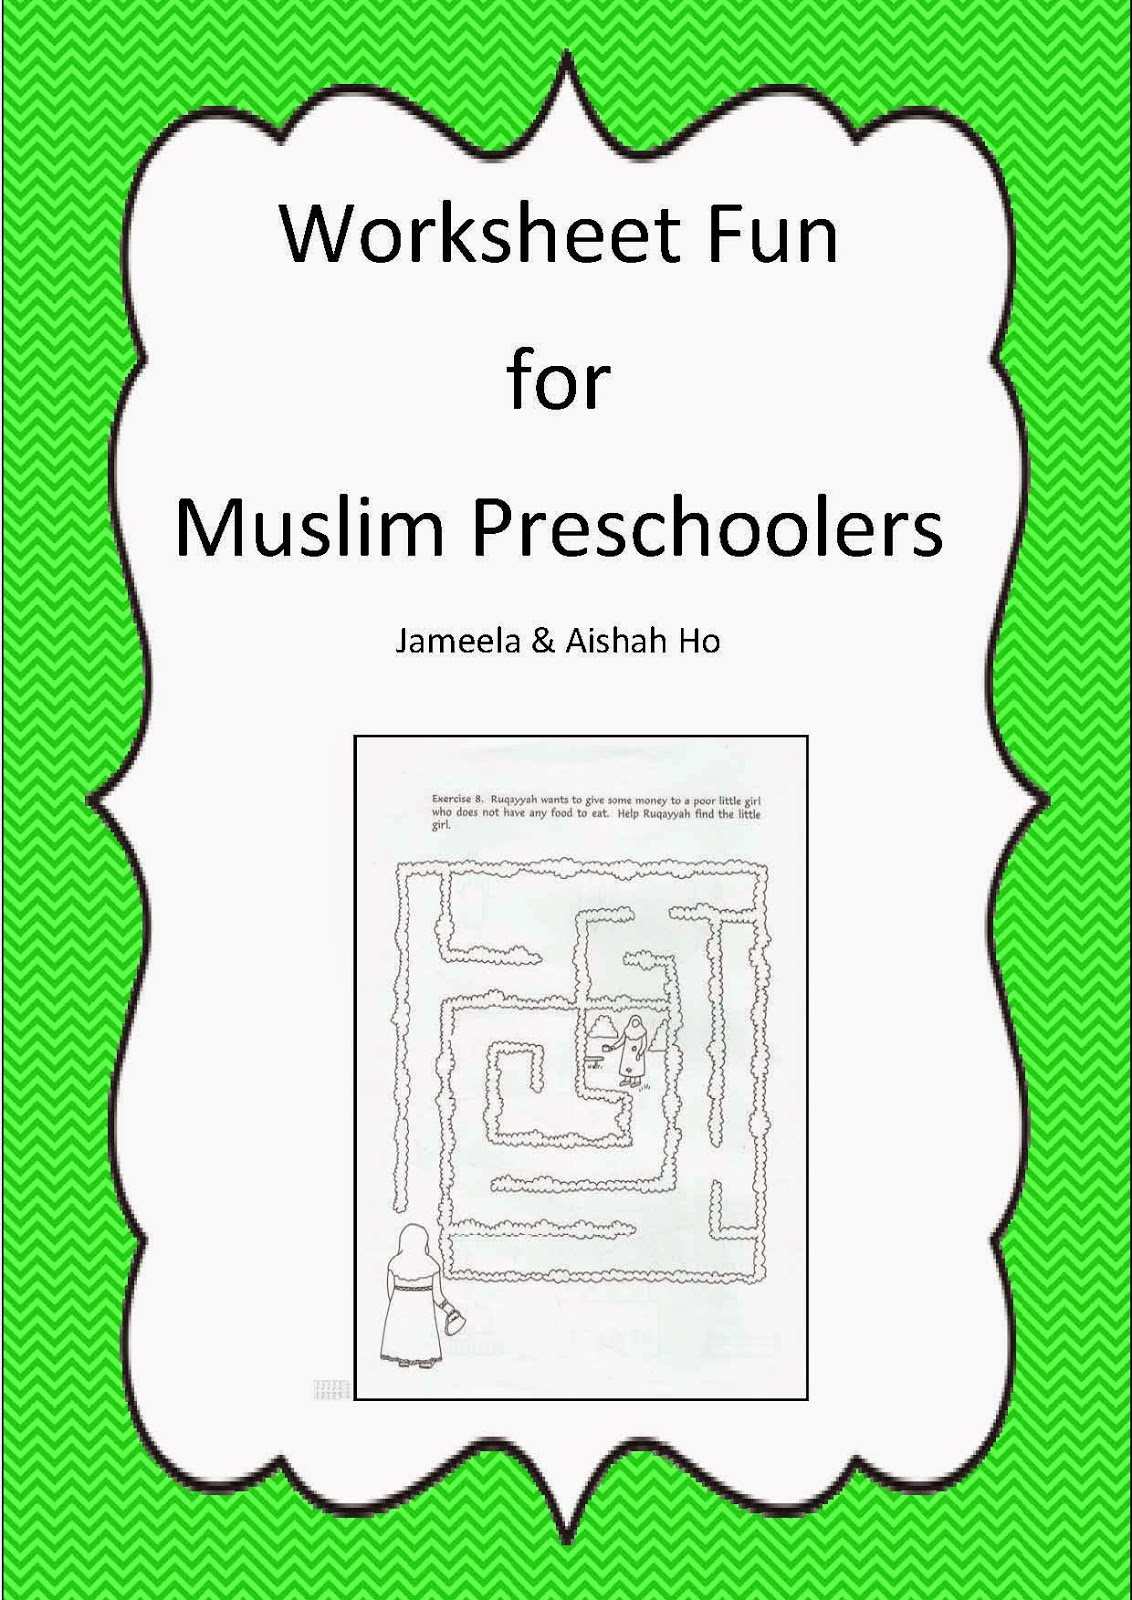 hight resolution of ILMA Education: Free Download: Worksheet Fun for Muslim Preschoolers